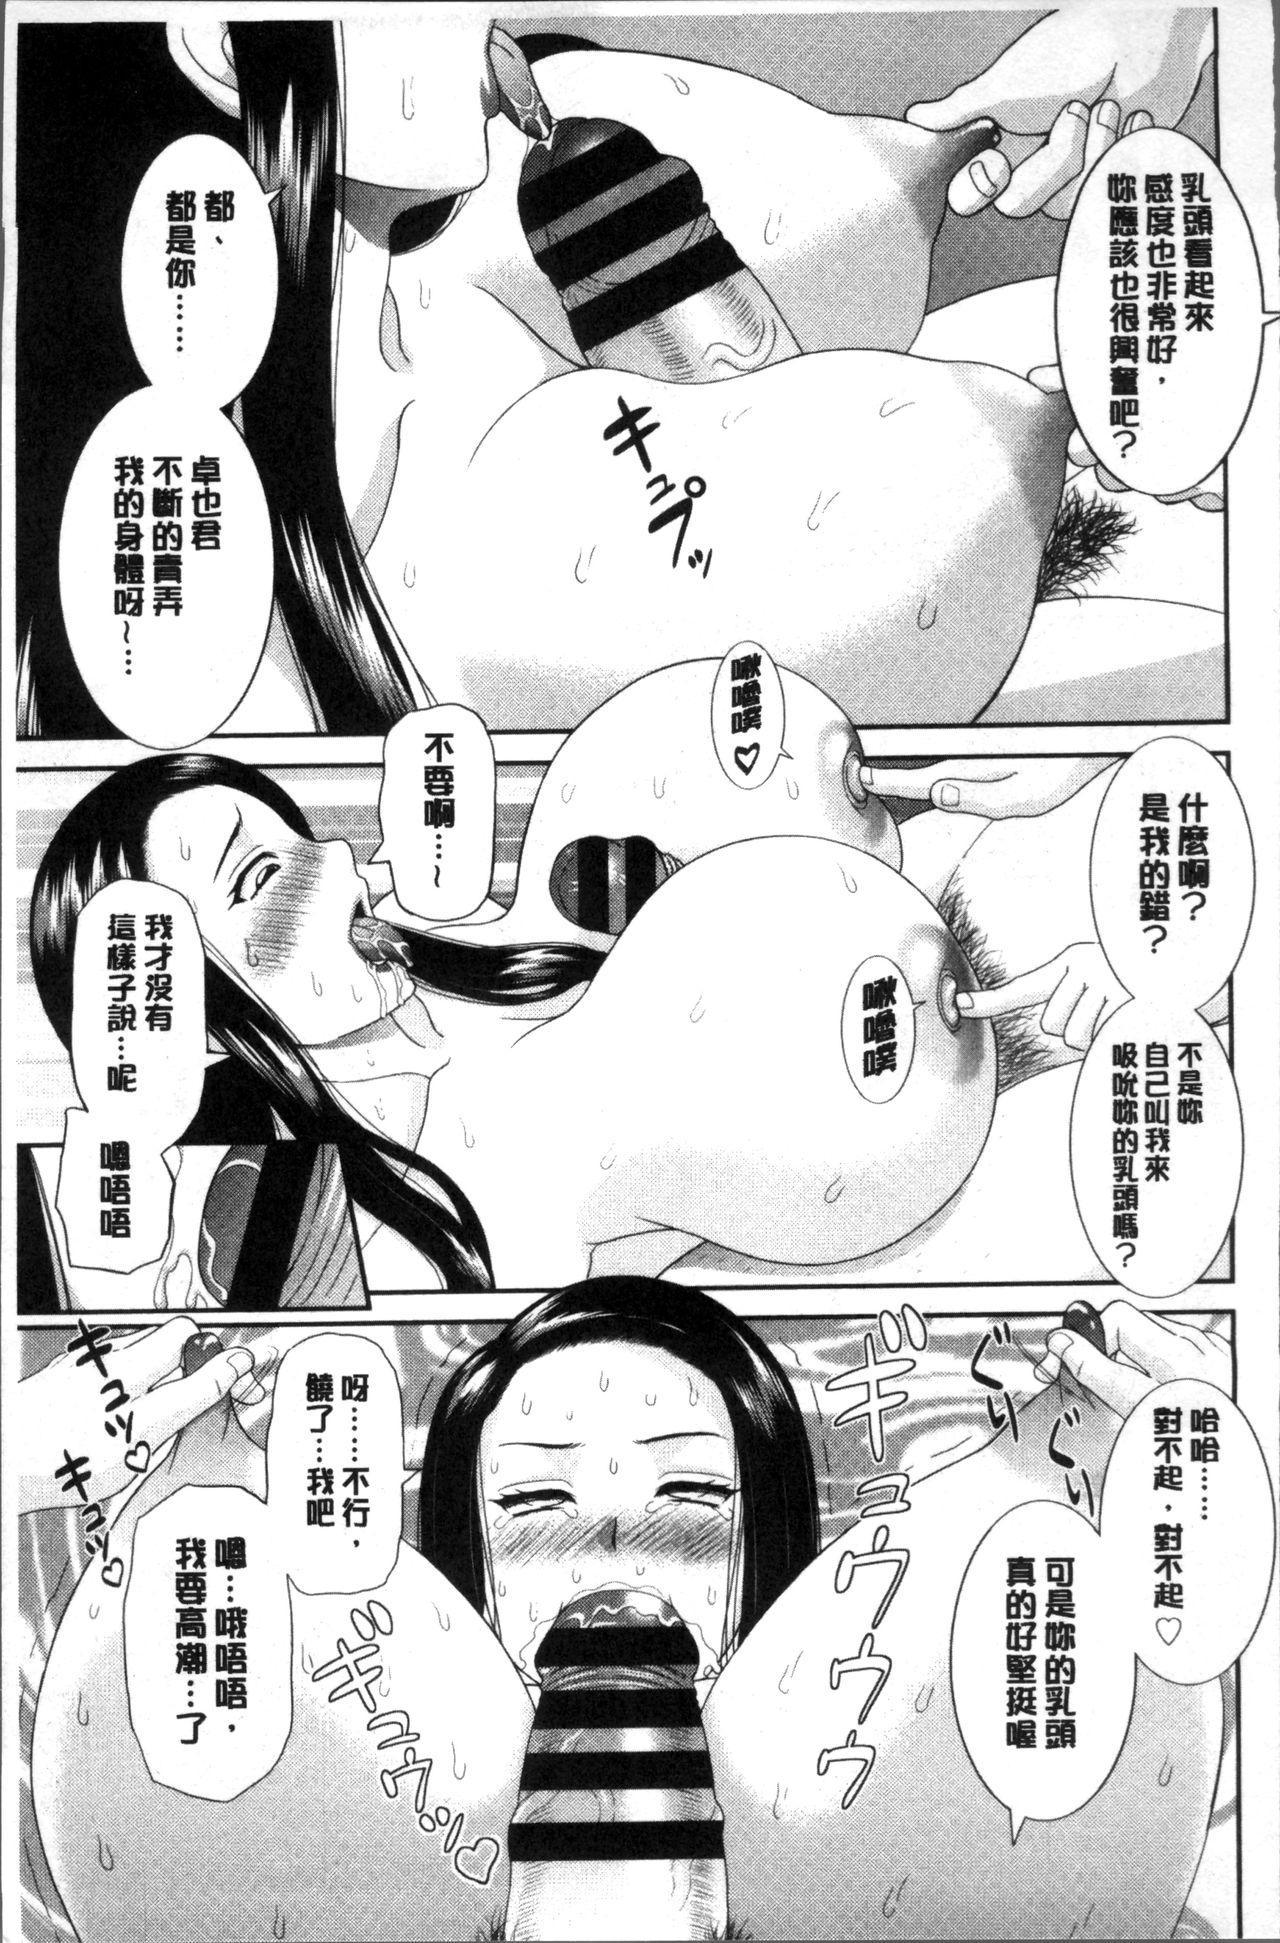 [Kawamori Misaki] Innyuu Shufu no Futei Ganbou - Oku-san to Kanojo to 2 | 淫乳主婦的不貞願望 和人妻也和女友❤2 [Chinese] 16